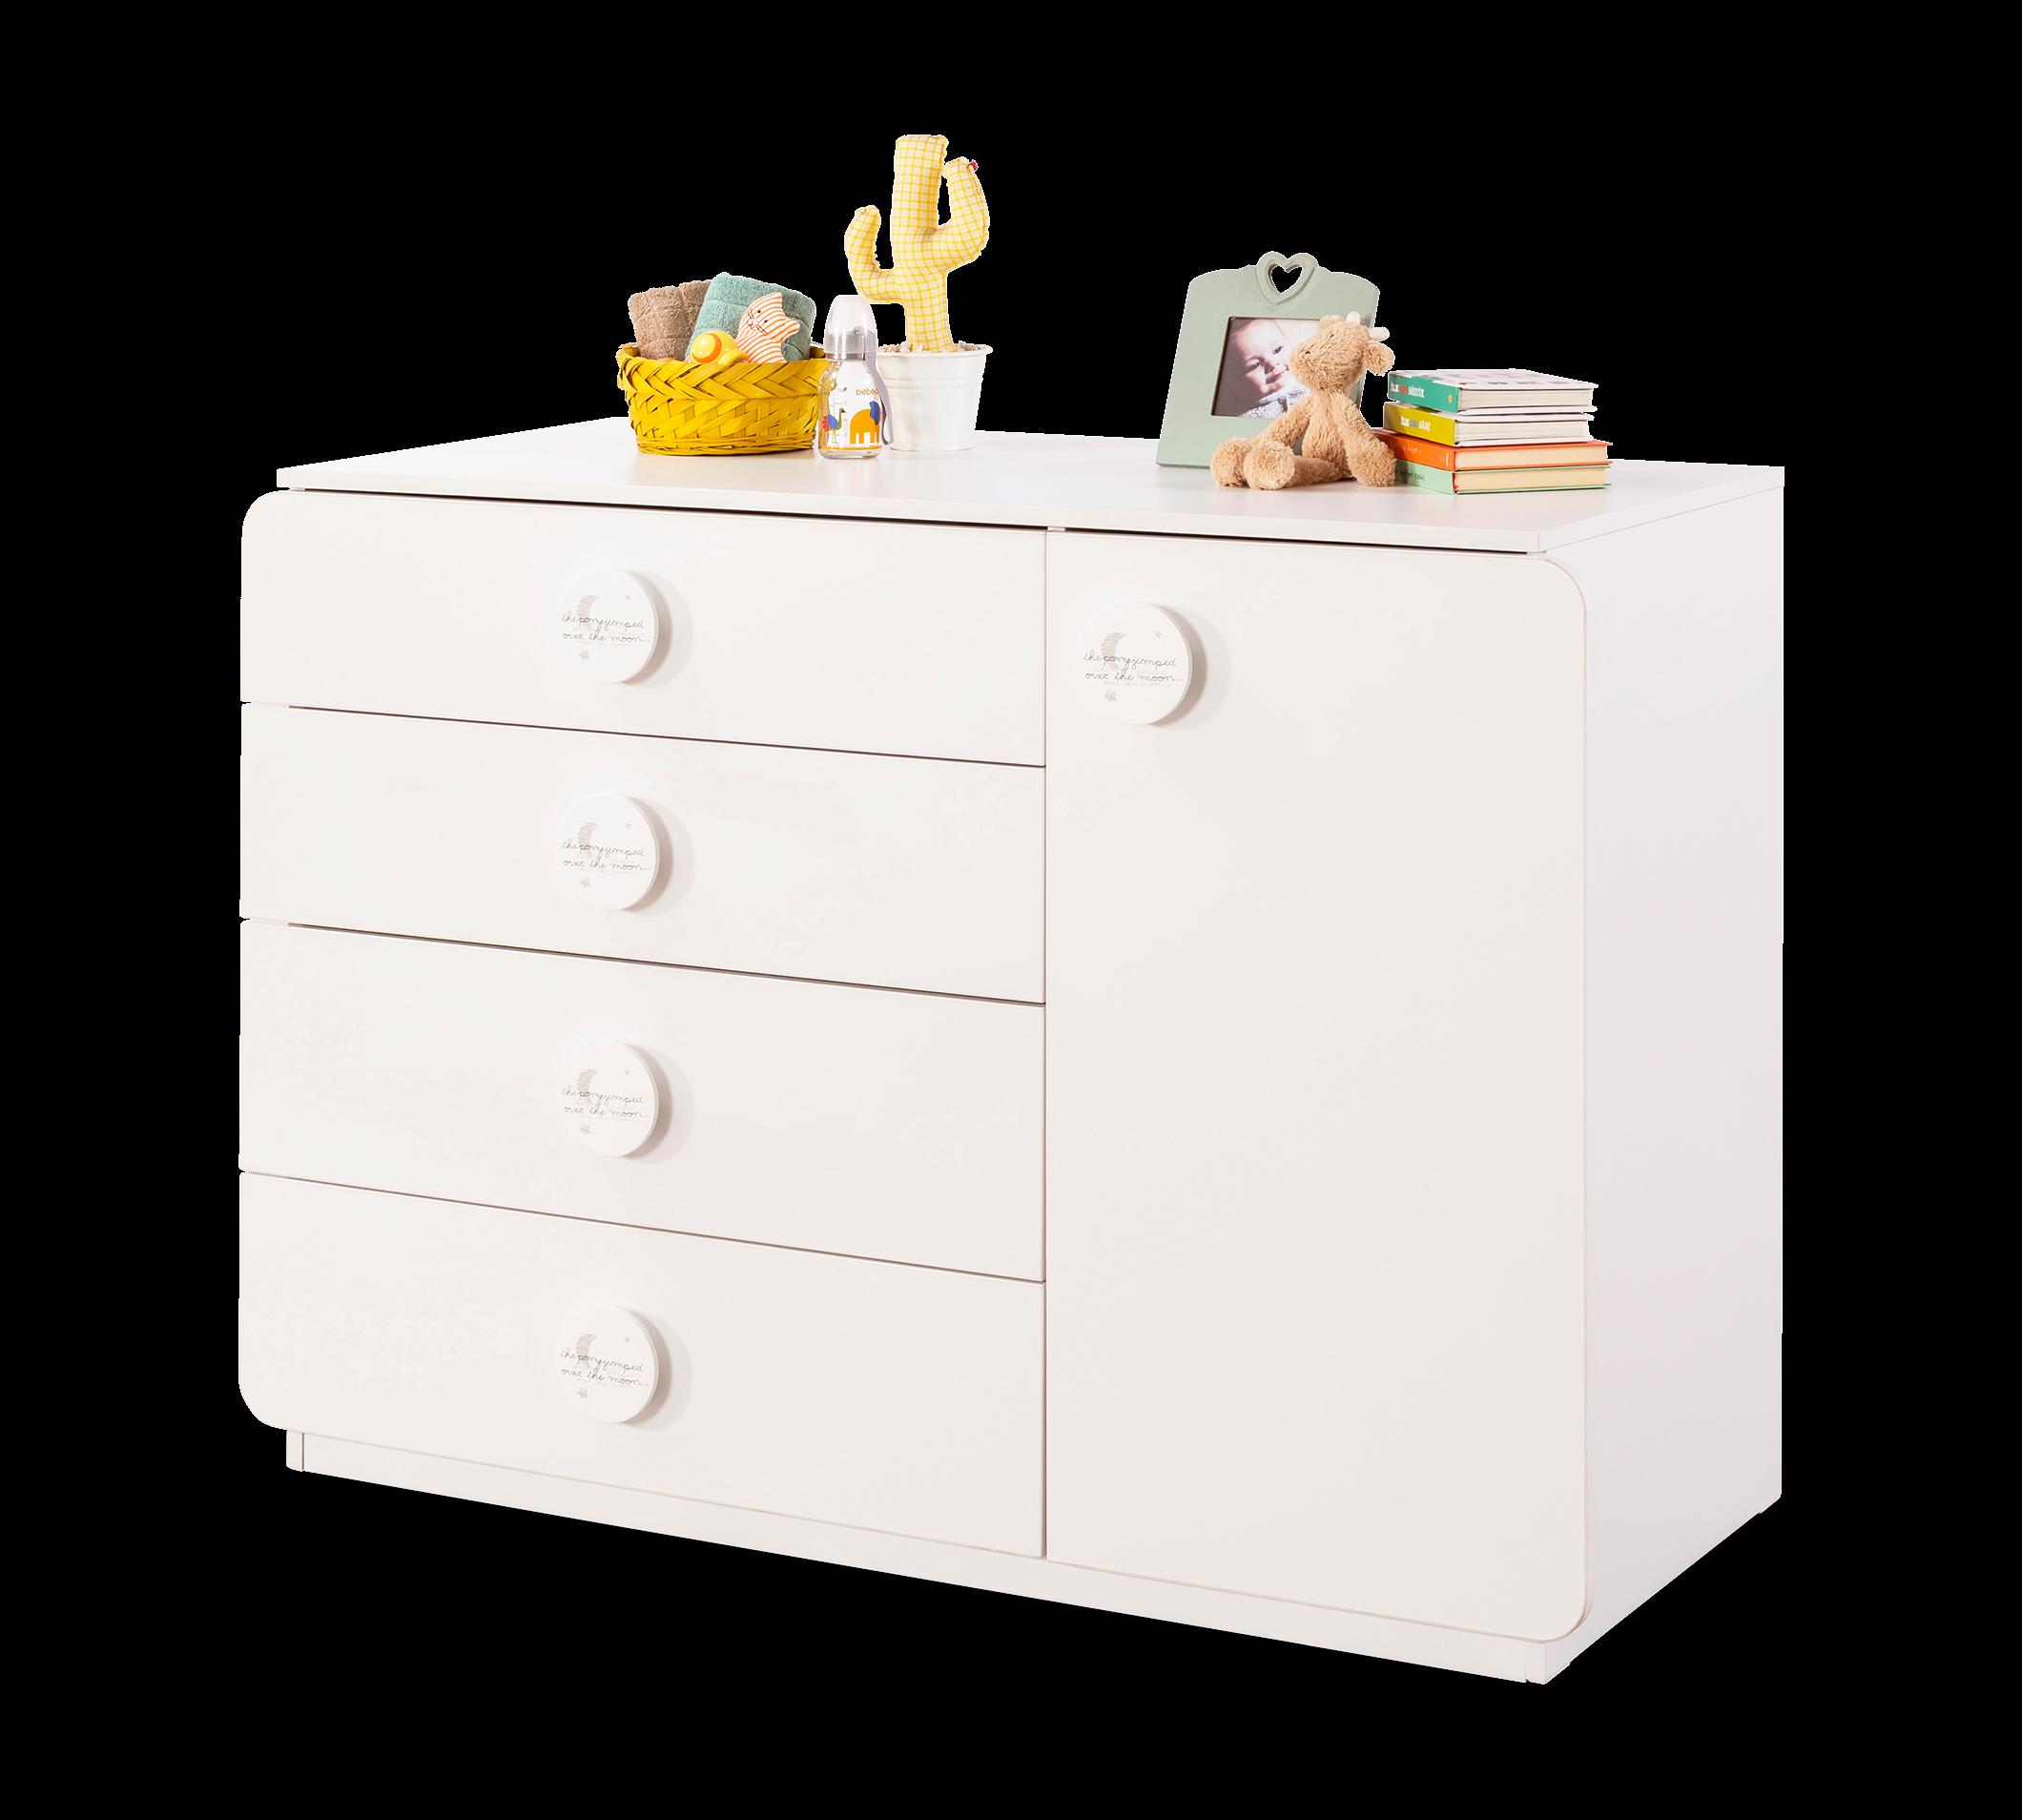 Comoda din pal cu 4 sertare si 1 usa, pentru bebe Baby Cotton Alb, l125xA56xH89 cm imagine